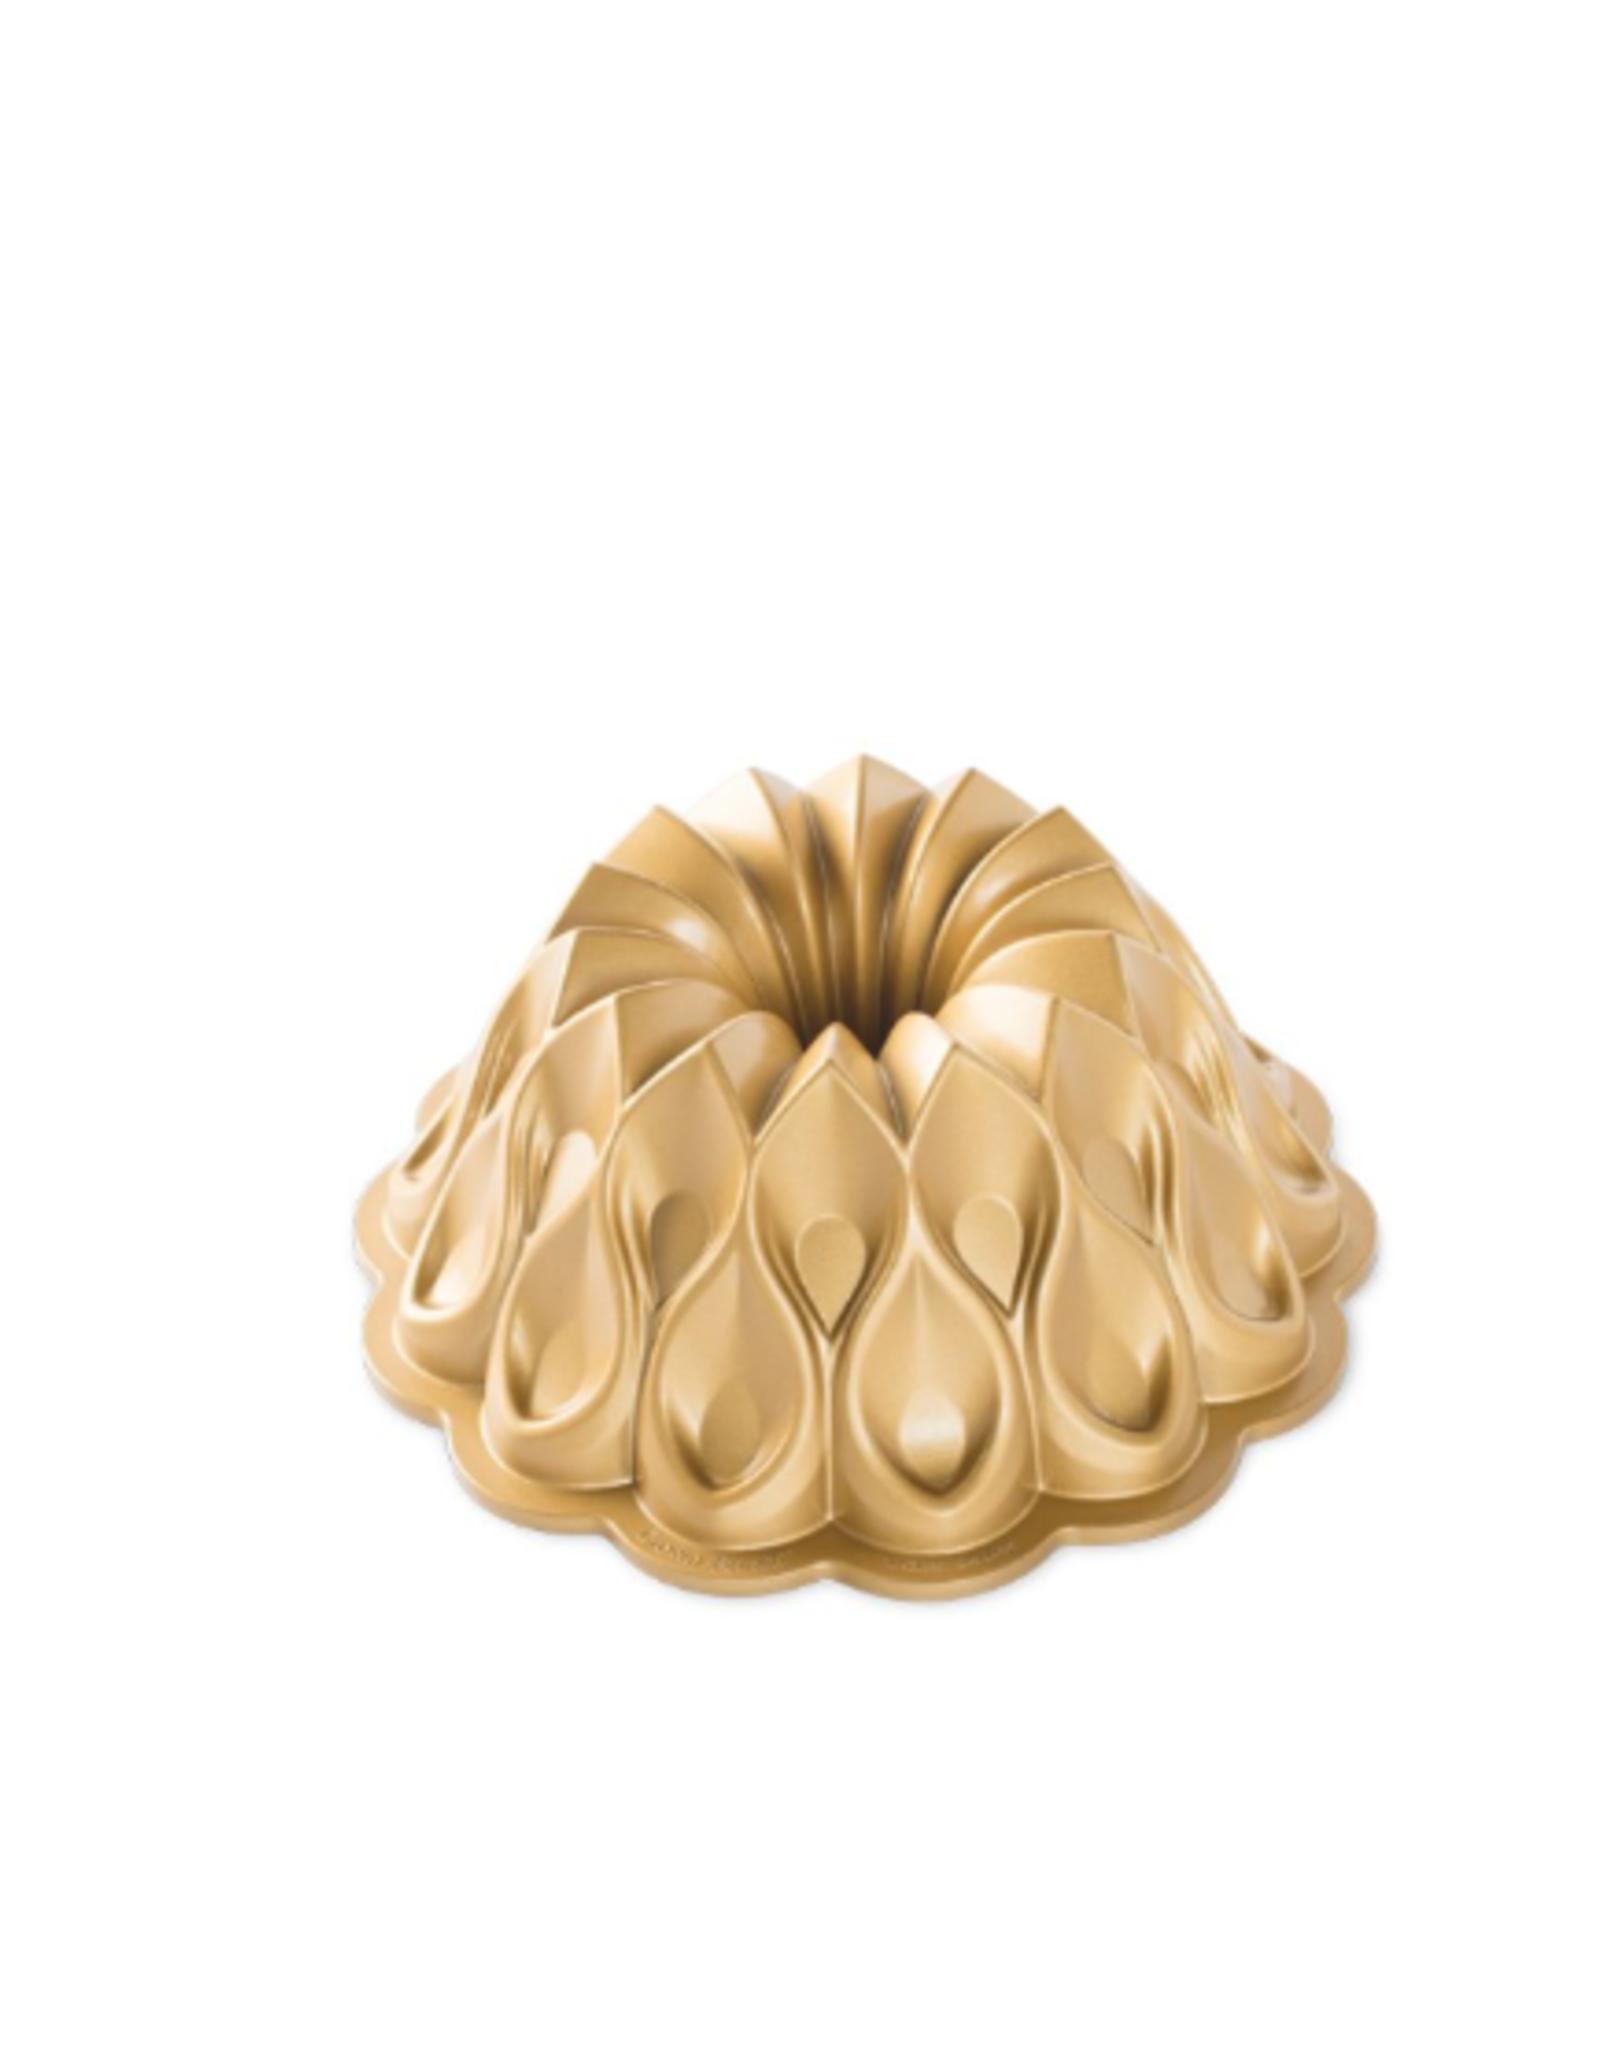 Nordicware Crown Bundt Pan, Gold Collection